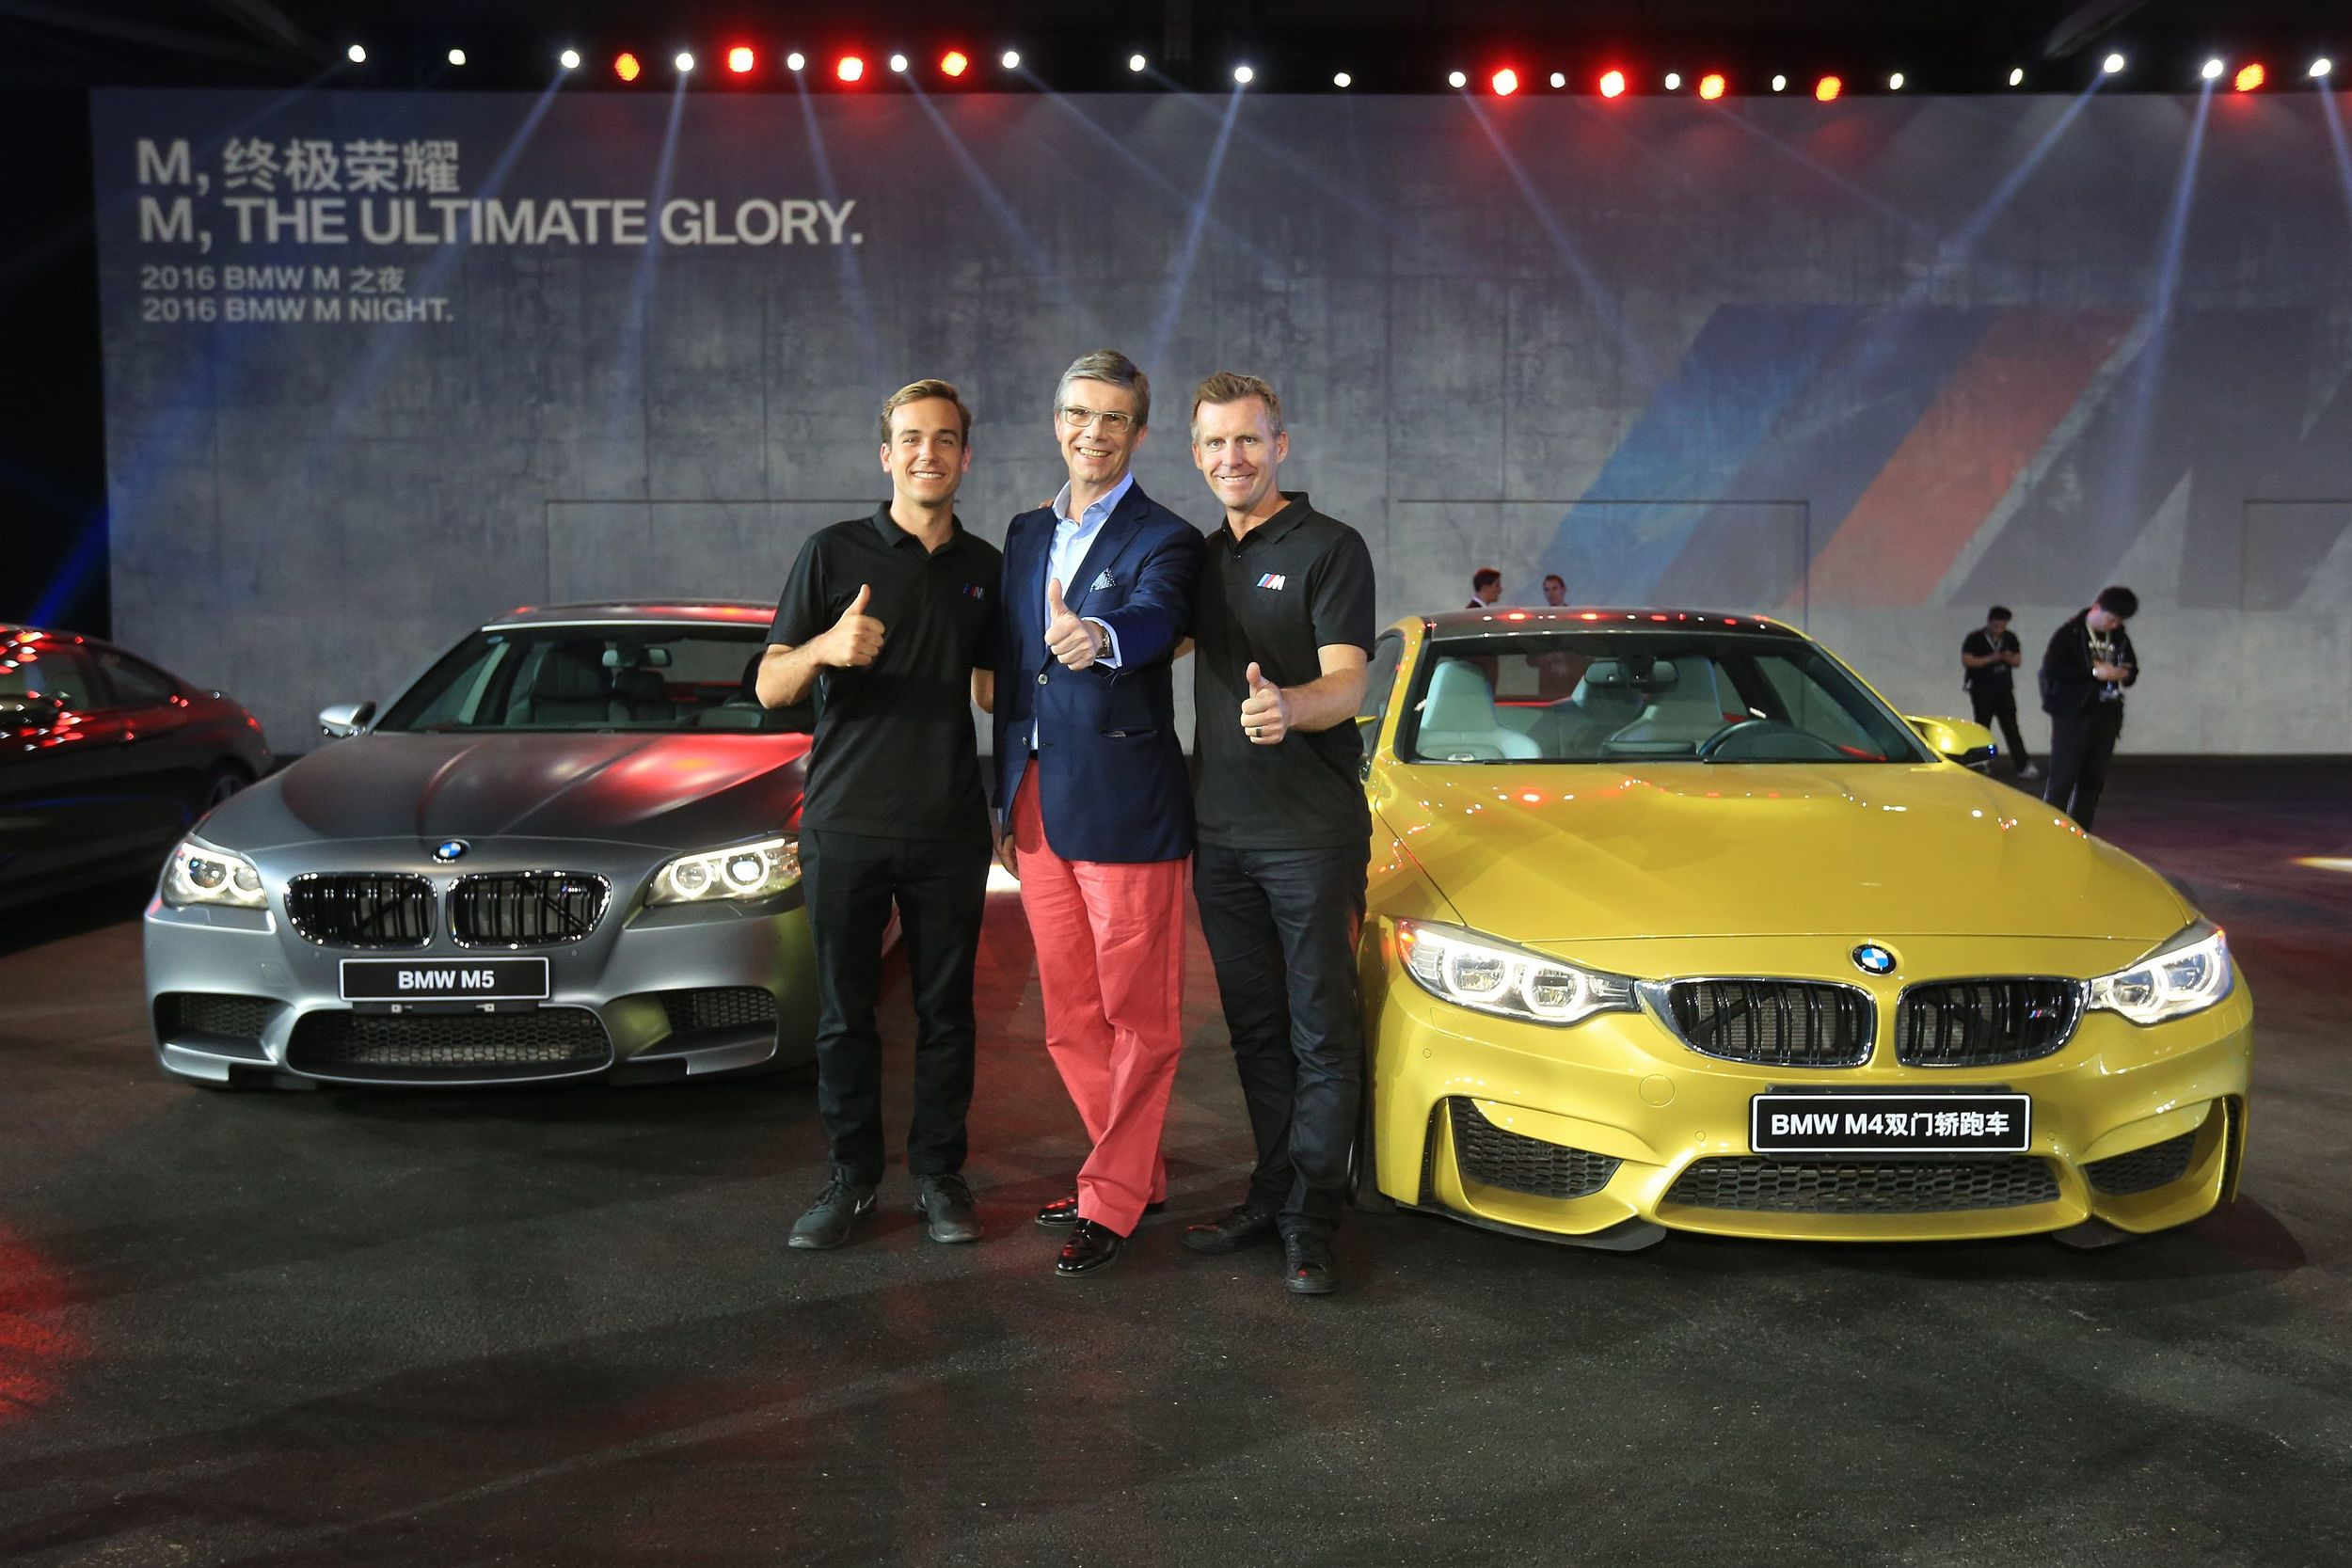 C244-20160424-BJ-BMW-YR1963-M.jpg